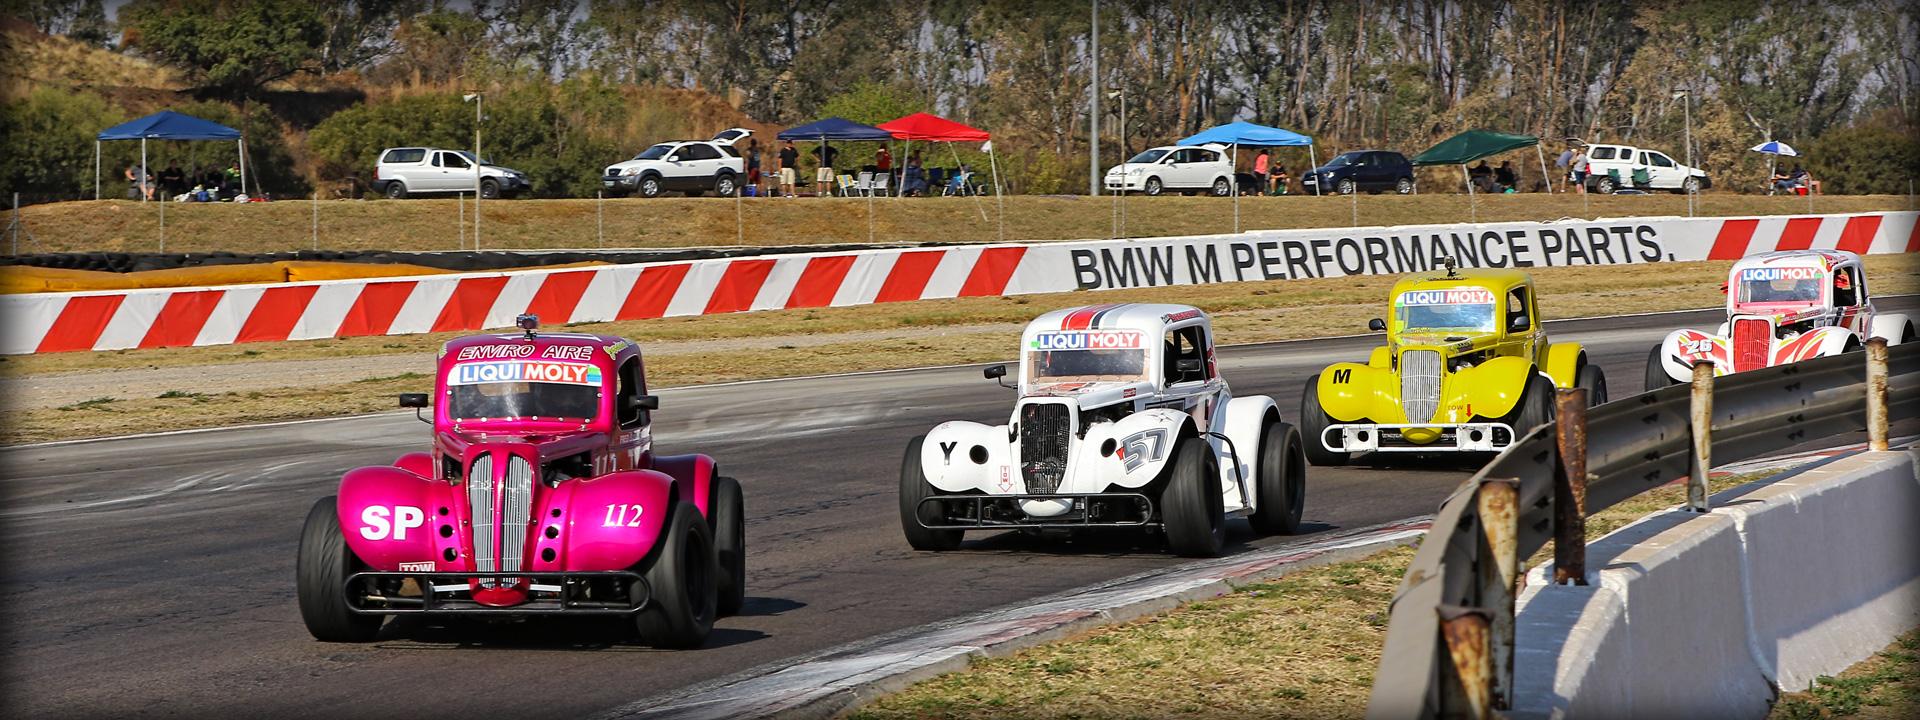 INEX Legends Championship - Round 8 - Zwartkops Raceway - 2016-09-03 - Race Report